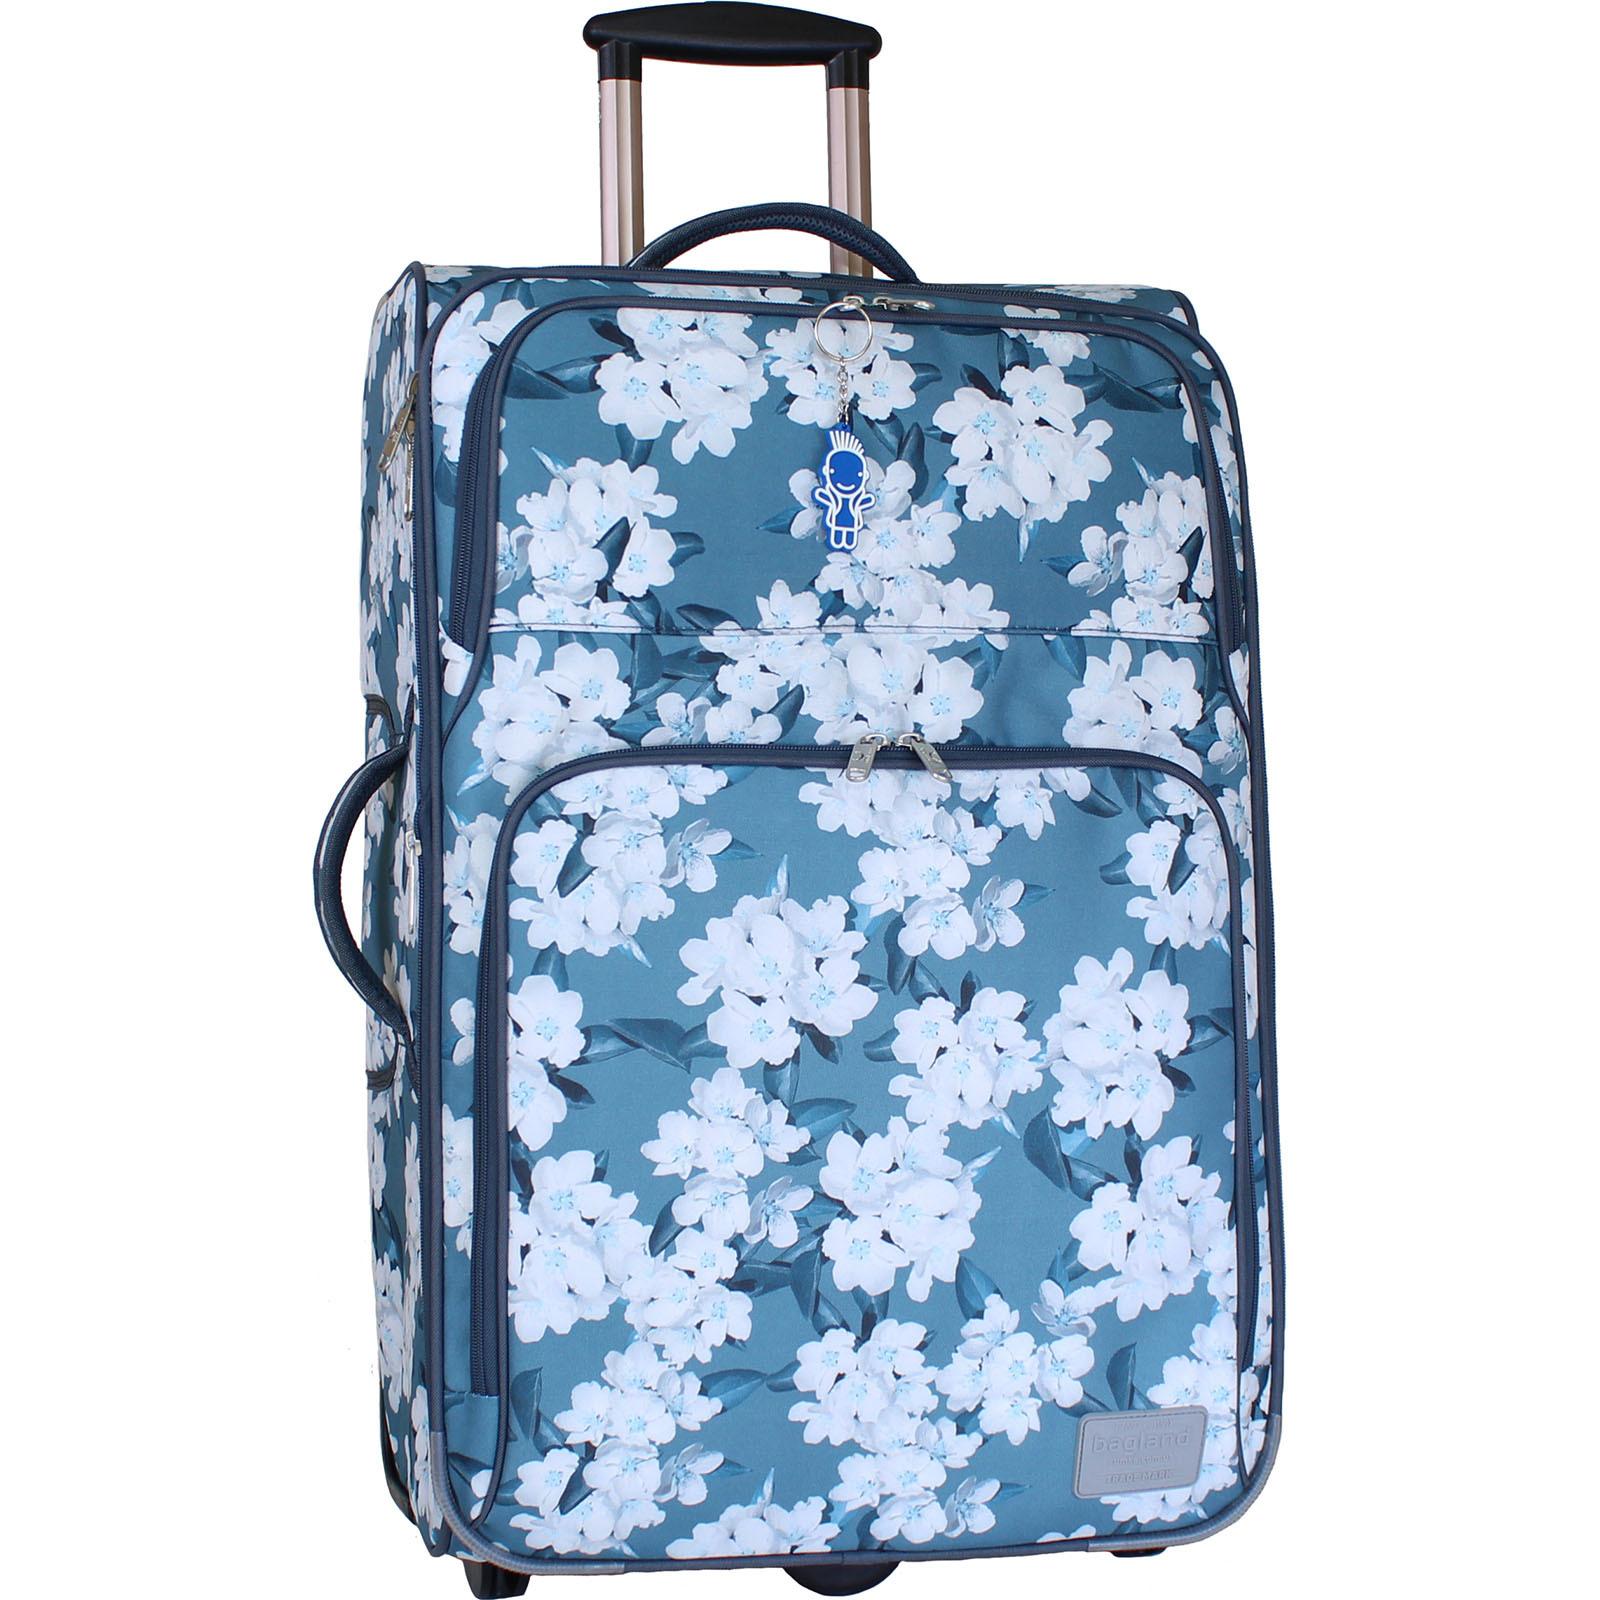 Дорожные чемоданы Чемодан Bagland Леон большой дизайн 70 л. сублімація 161 (0037666274) IMG_9745.JPG